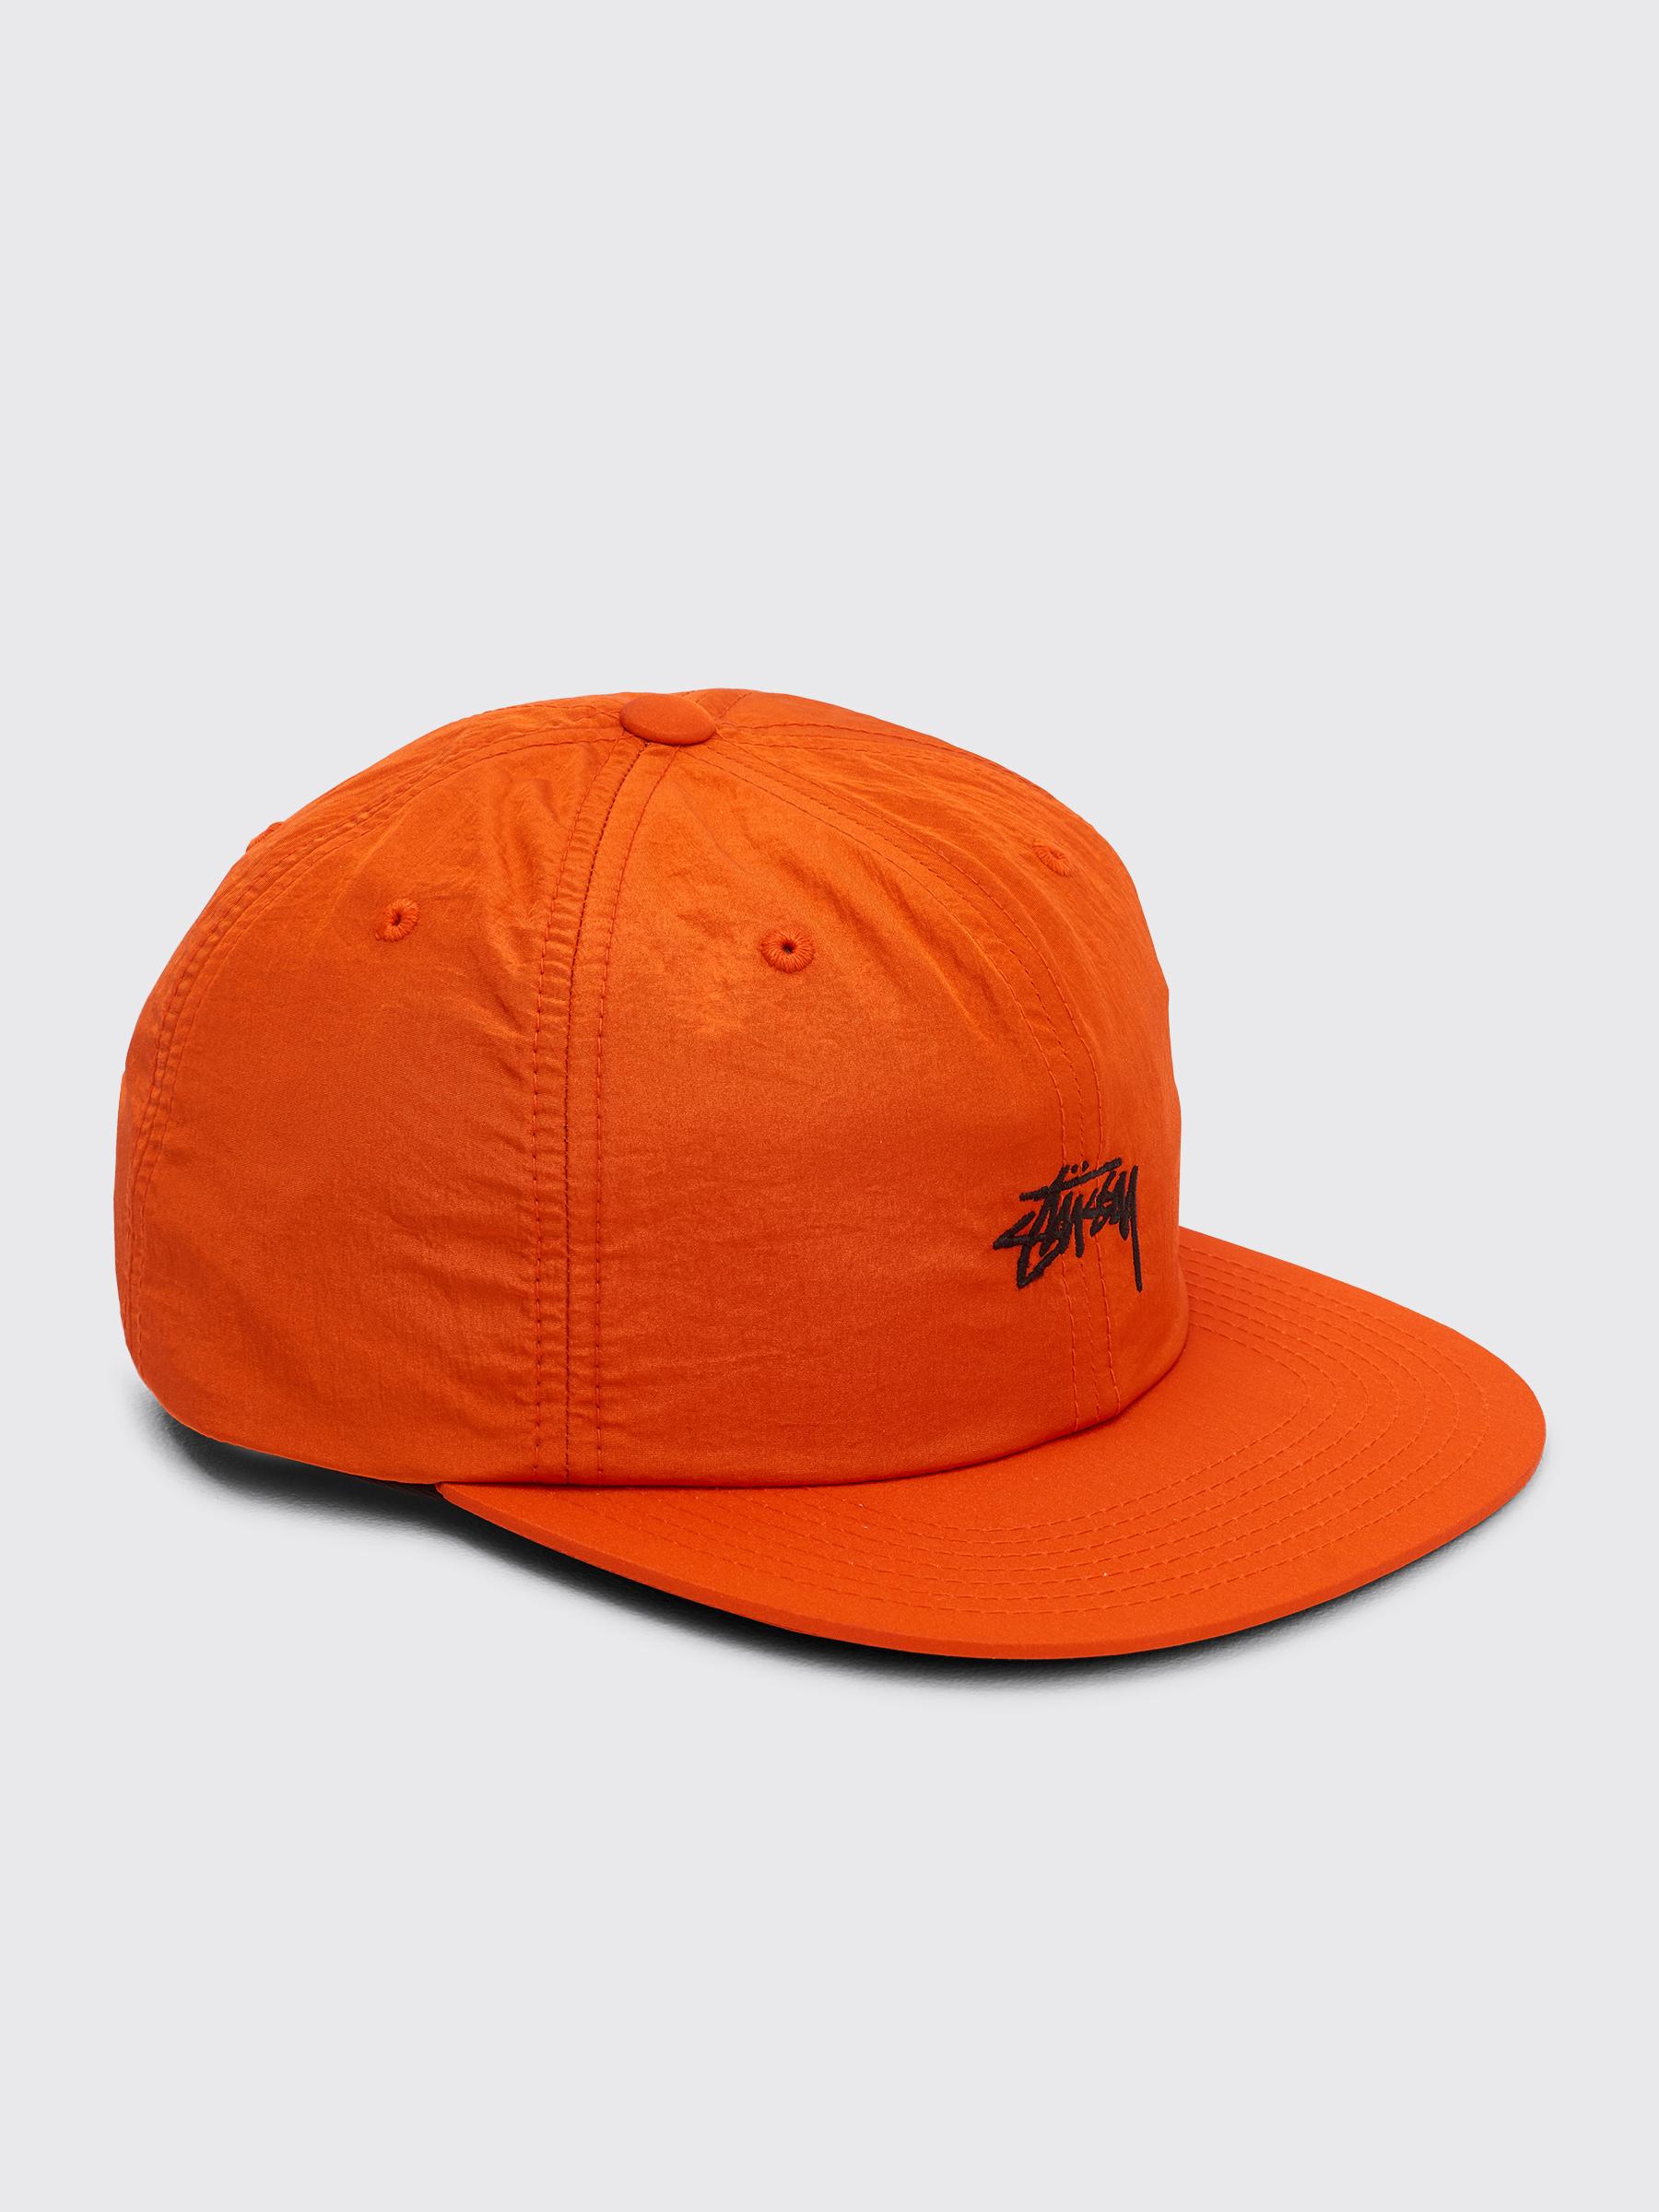 9facc0c4a79 Très Bien - Stüssy Stock Nylon Strapback Cap Orange